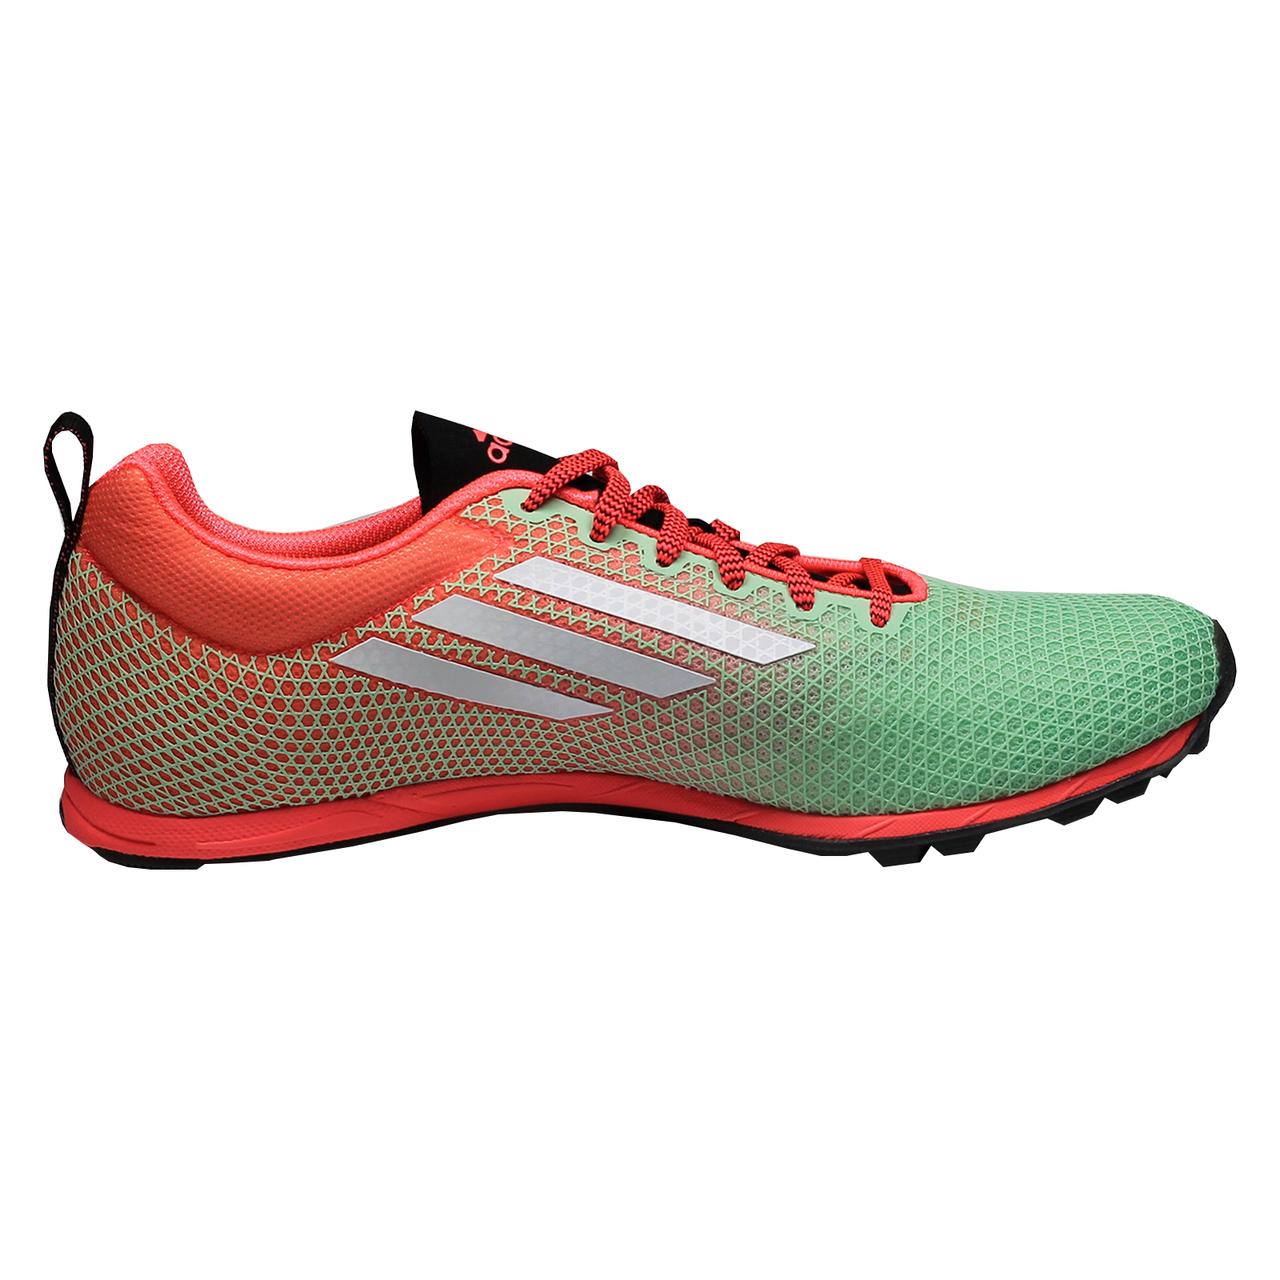 4f744e8d791 Adidas XCS 6 Women s Track Shoes B33776 - Green